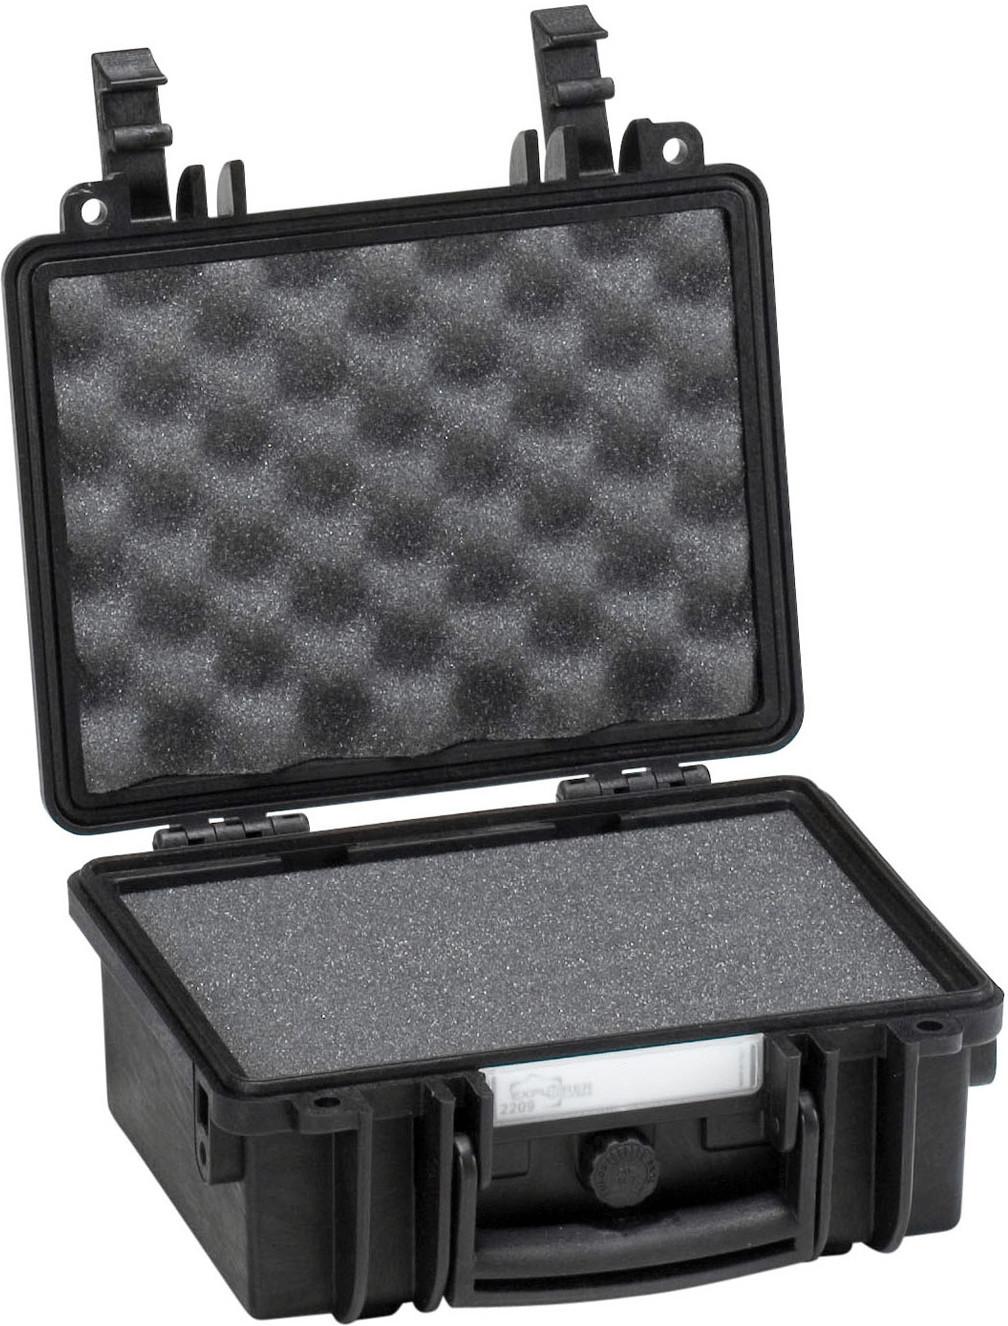 Image of Explorer Cases 2209